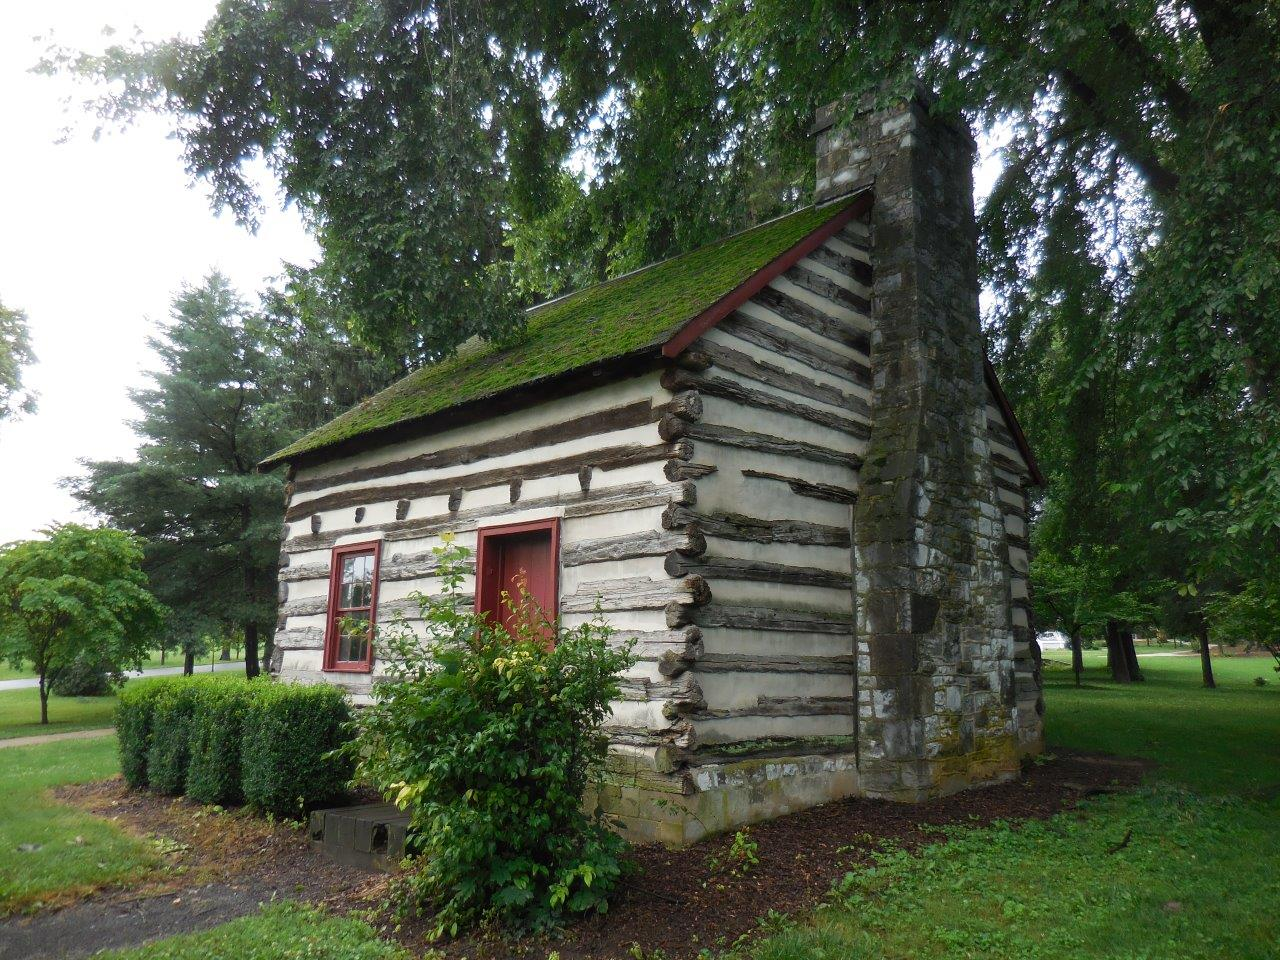 James Buchanan birthplace cabin in Mercersburg, Pennsylvania